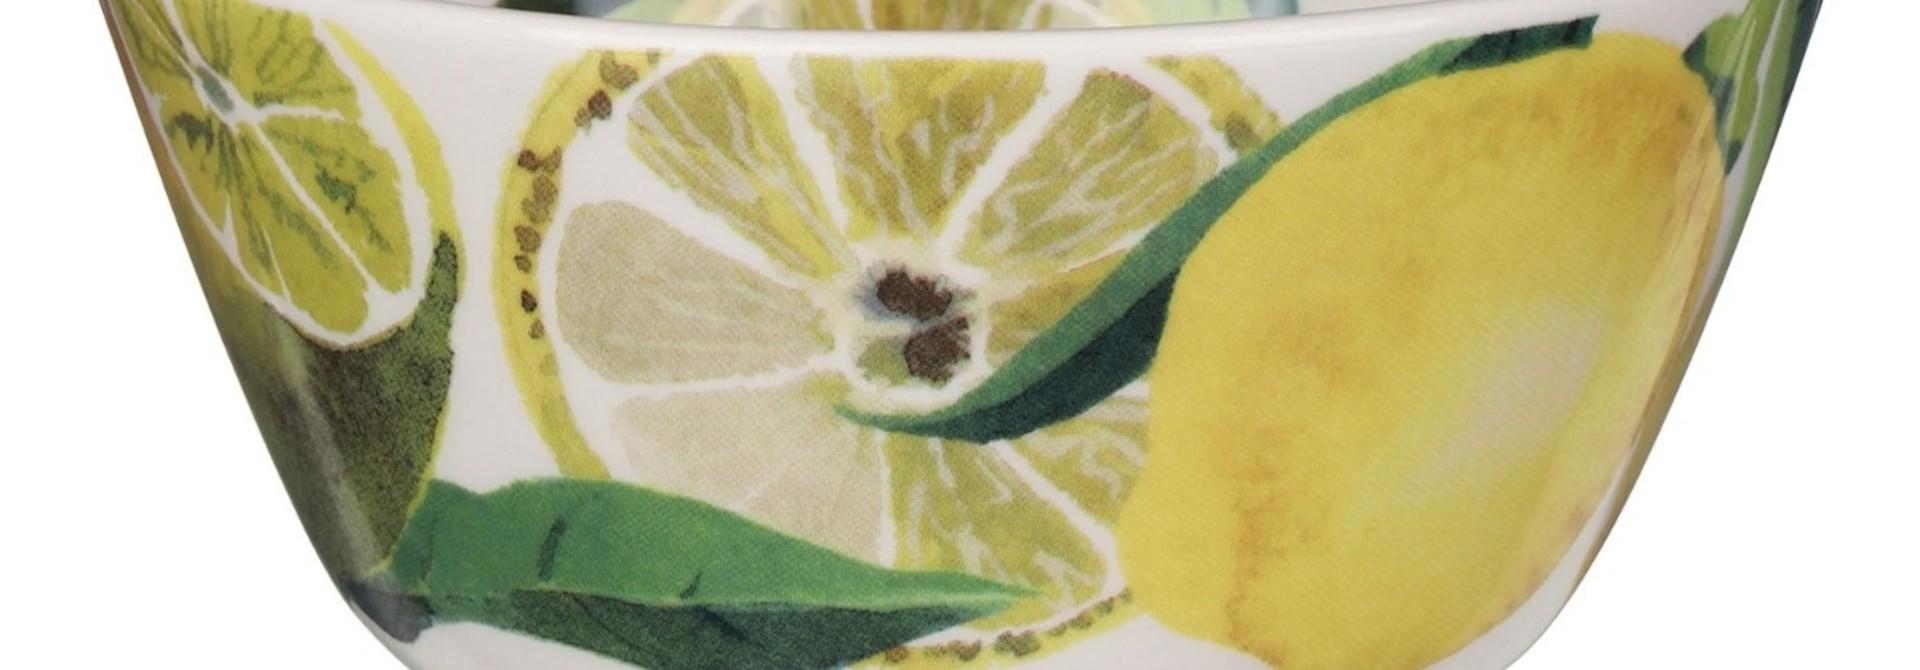 Bowl - Lemons - Small